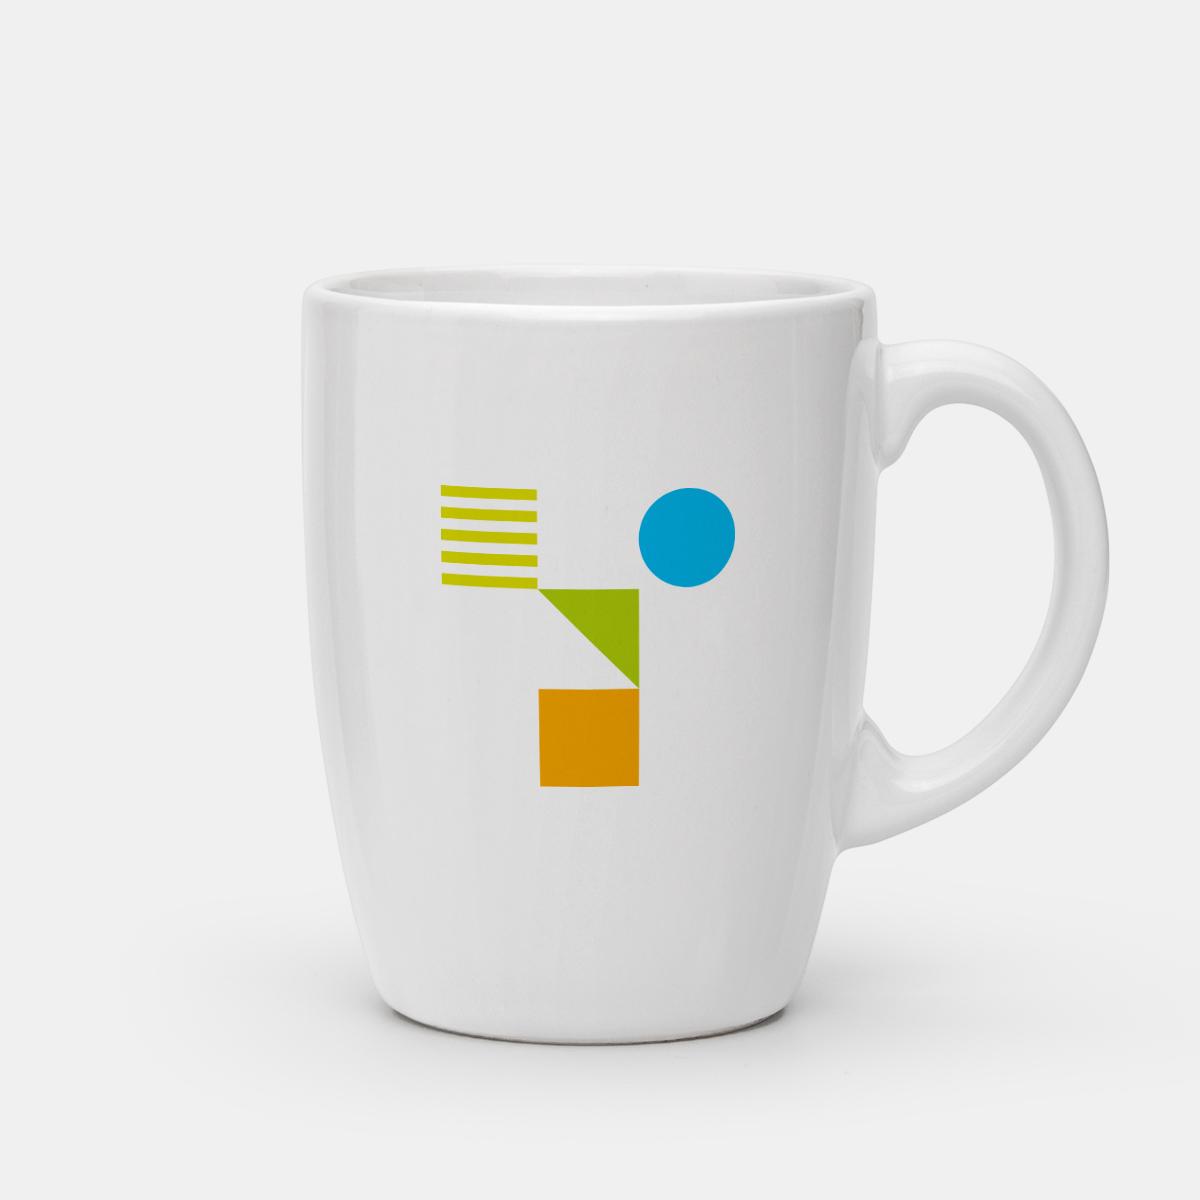 Madebytops-koffie